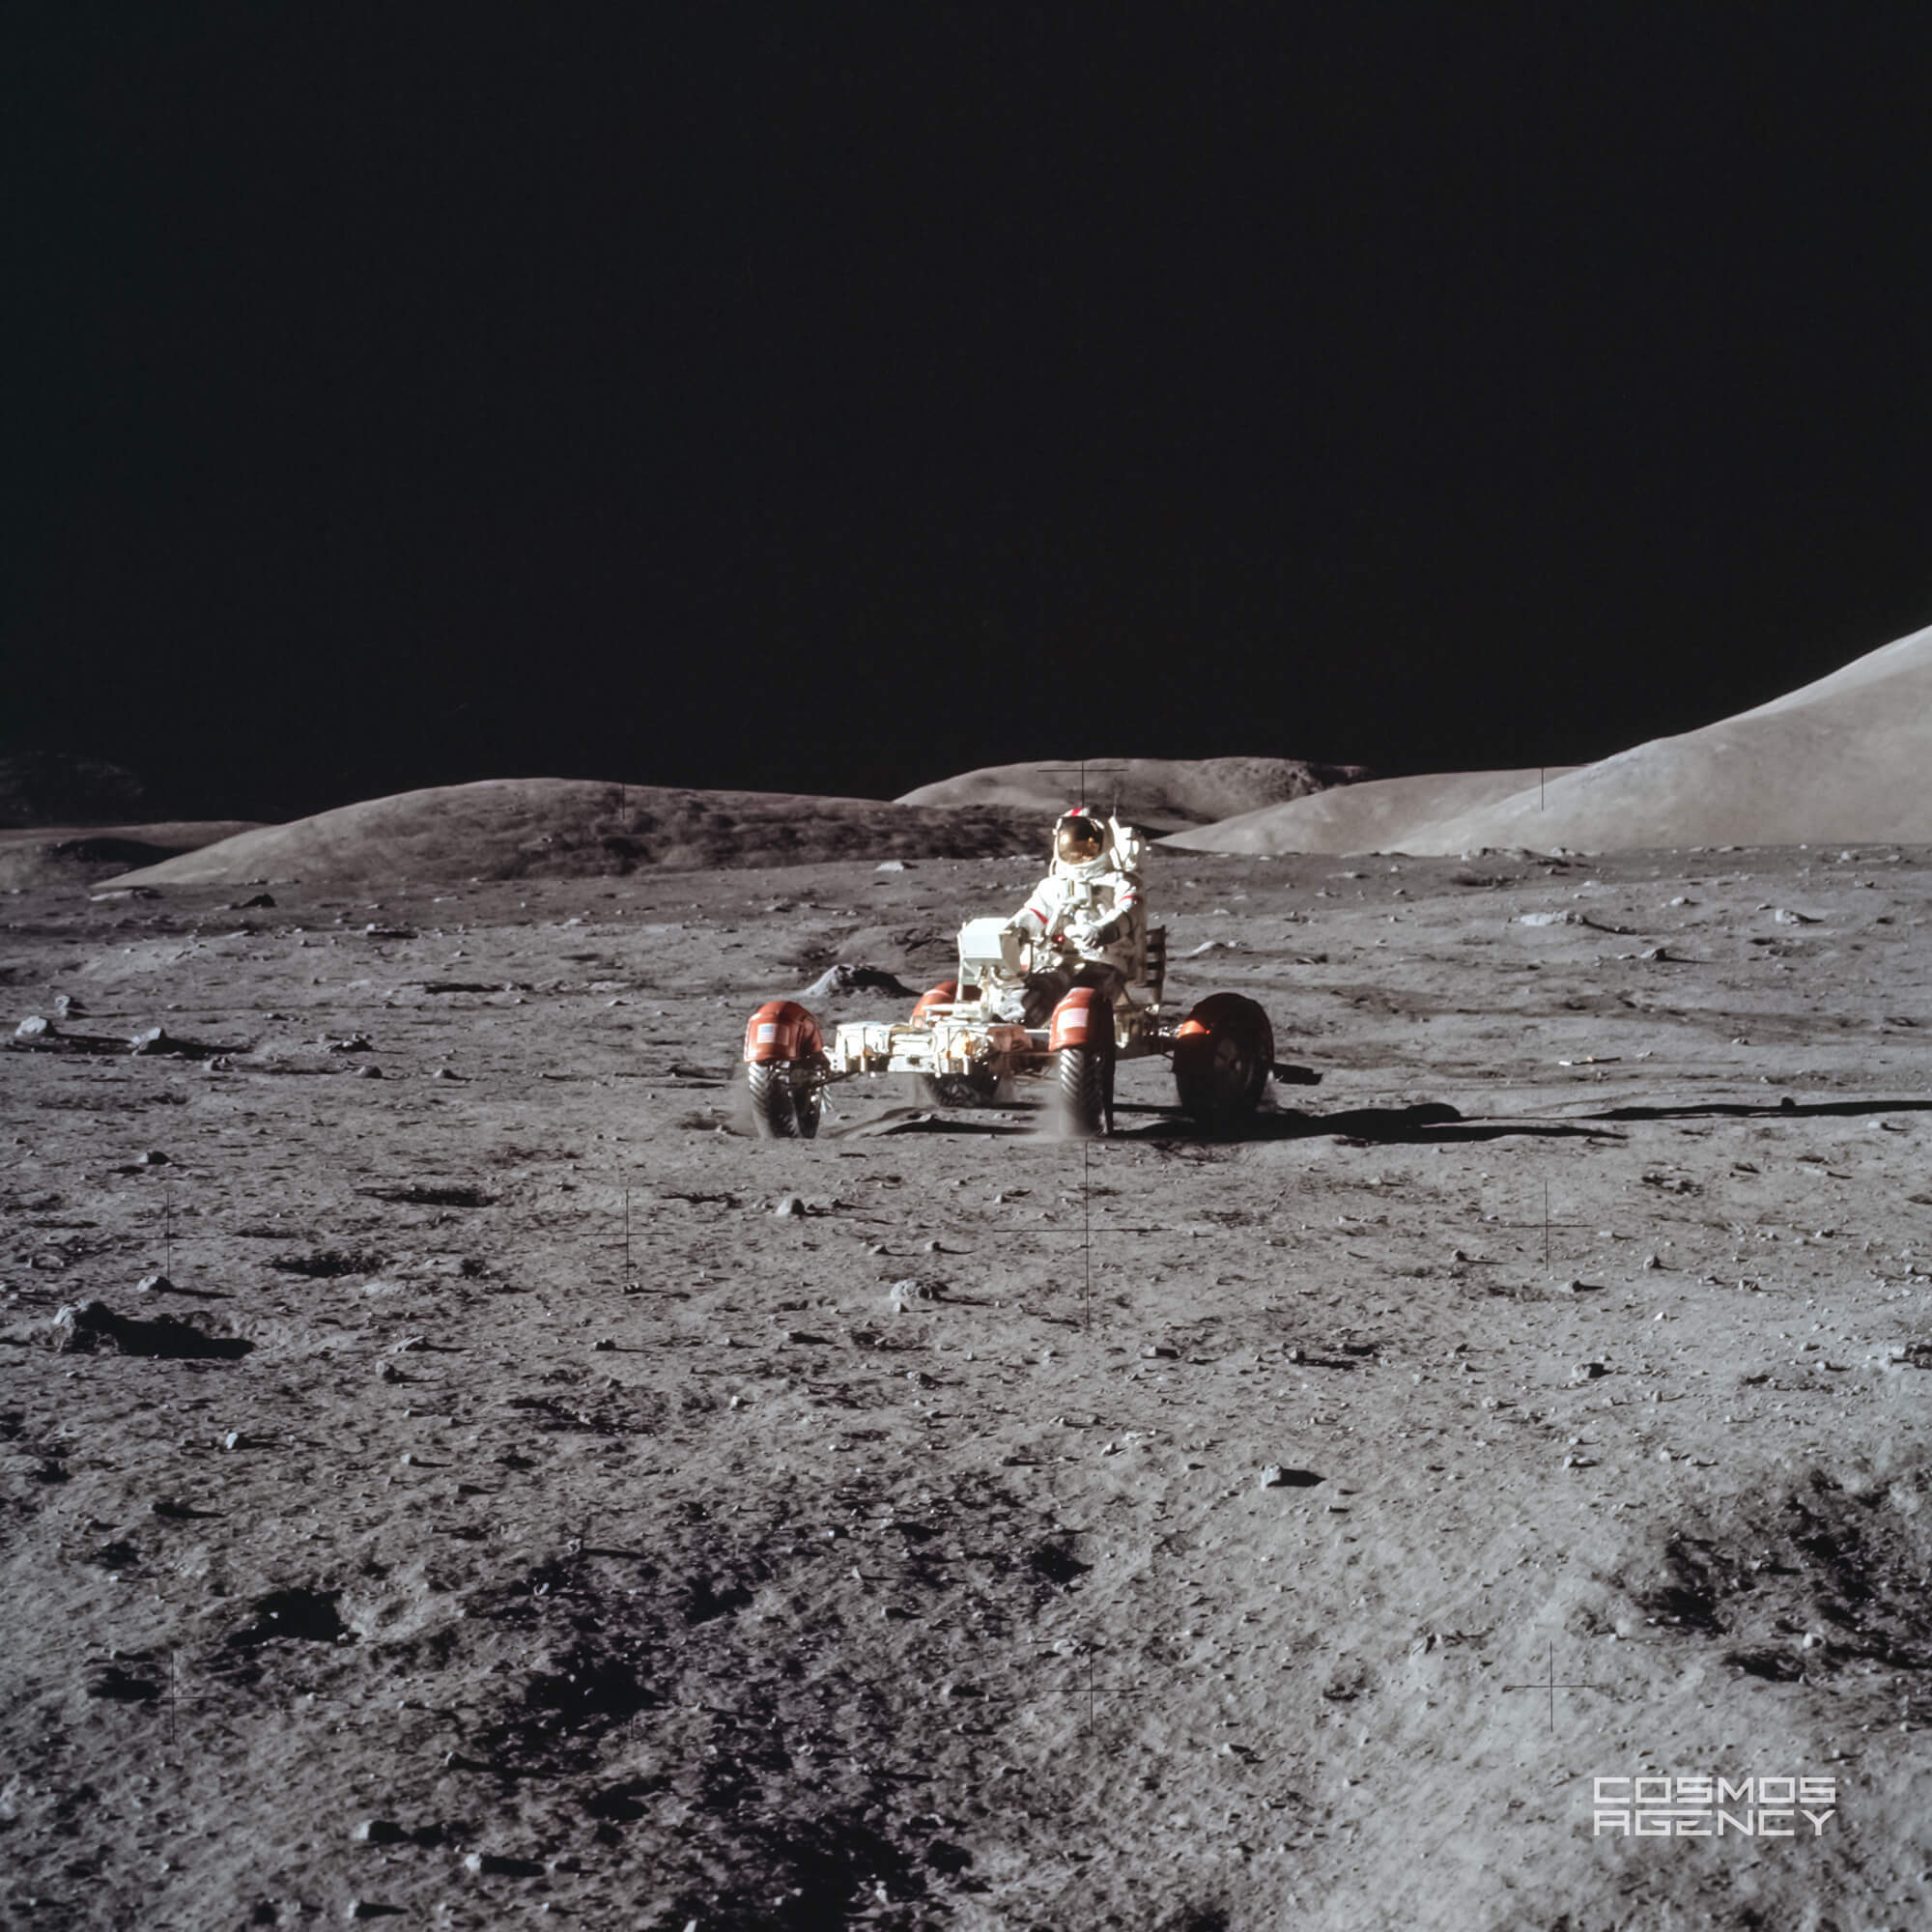 Астронавт NASA Юджин Сернан разъезжает на Лунном ровере, Аполлон 17, 1972